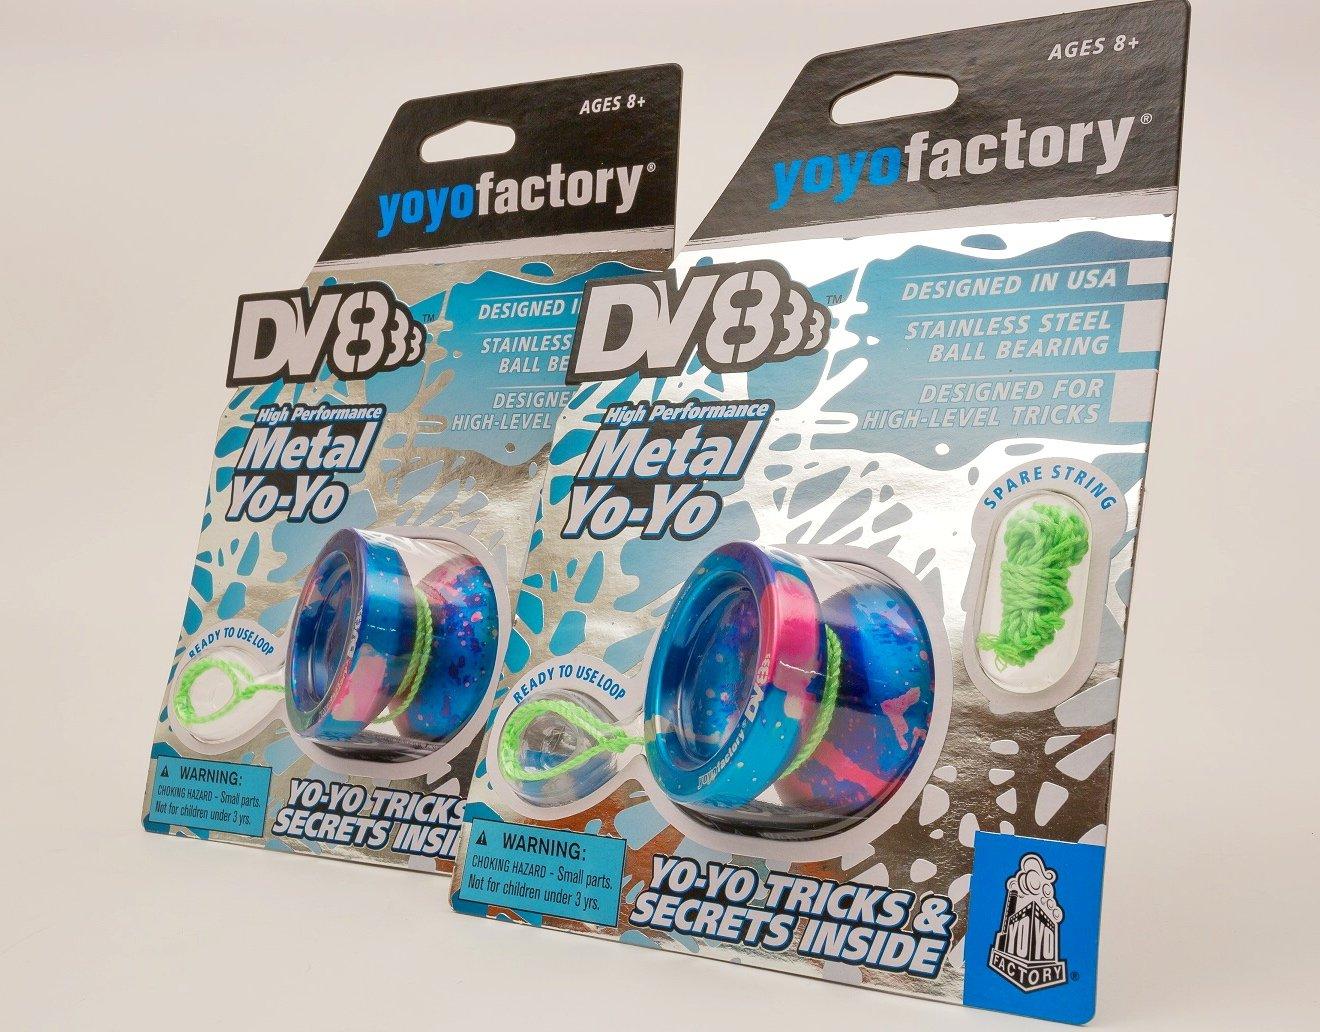 YoYoFactory DV888 Ball Bearing Matal - Galaxy Acid Wash by YoYoFactory